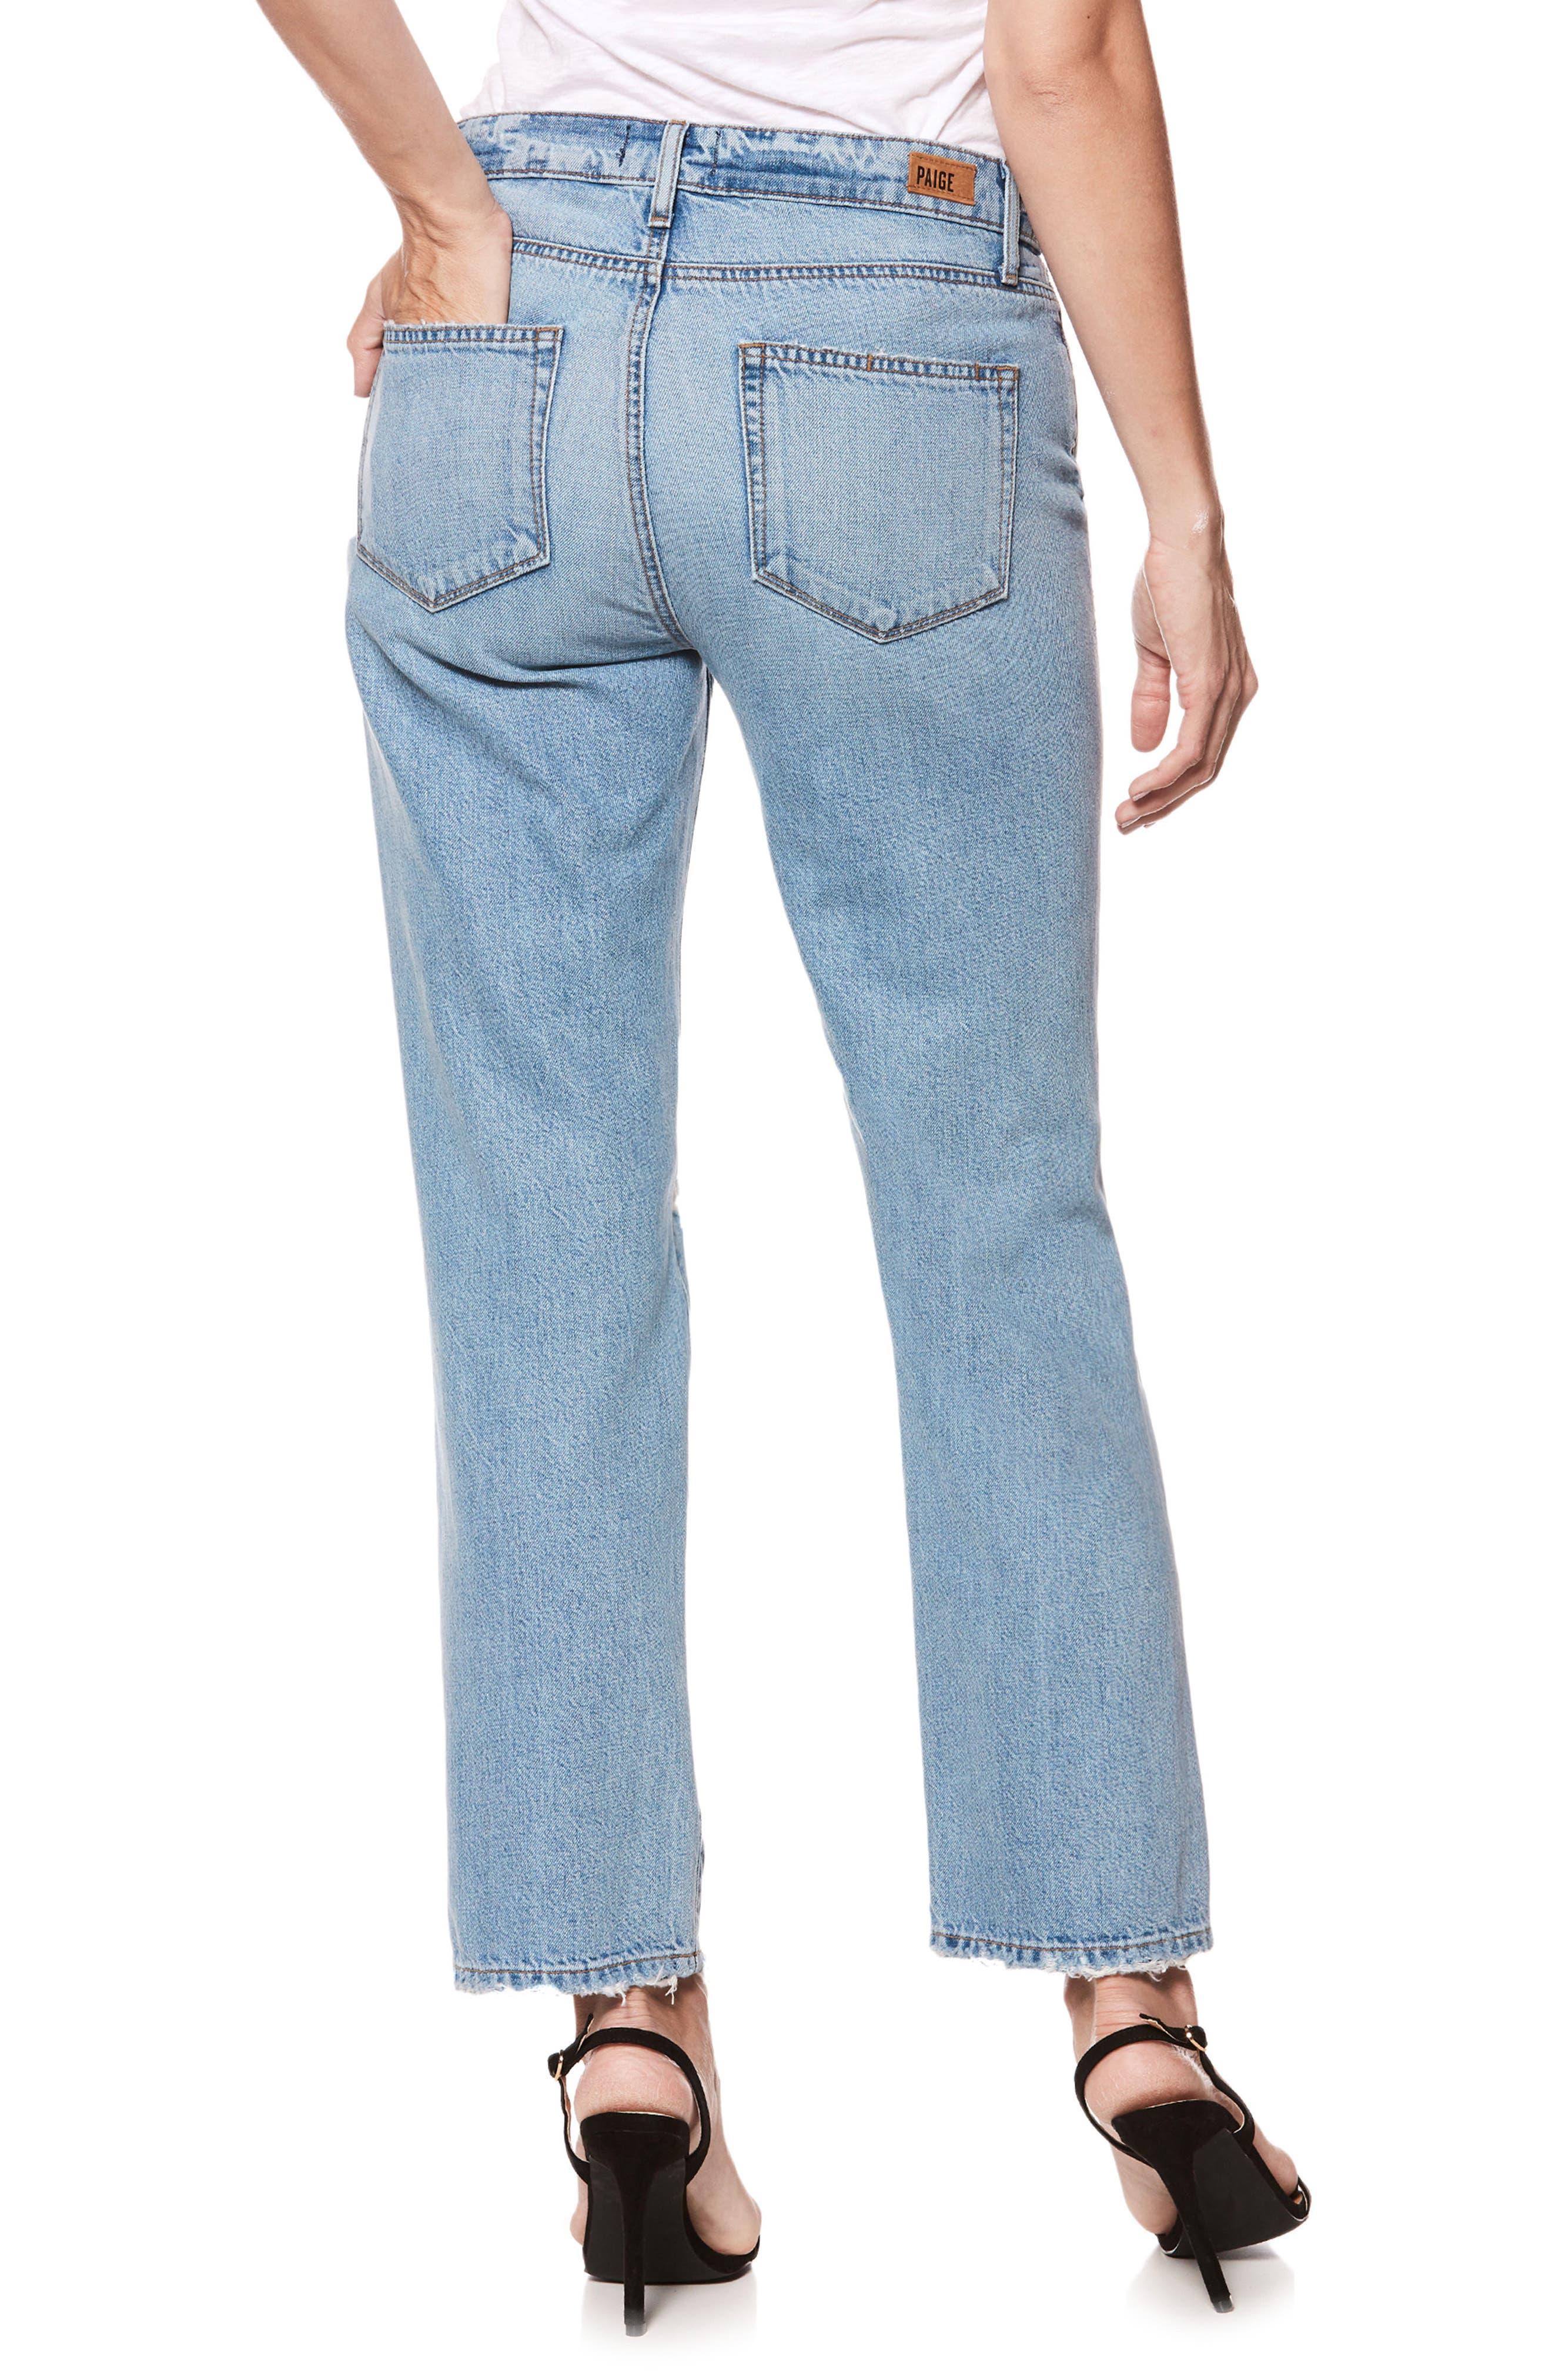 Noella Ripped Straight Leg Jeans,                             Alternate thumbnail 3, color,                             Jovie Destructed